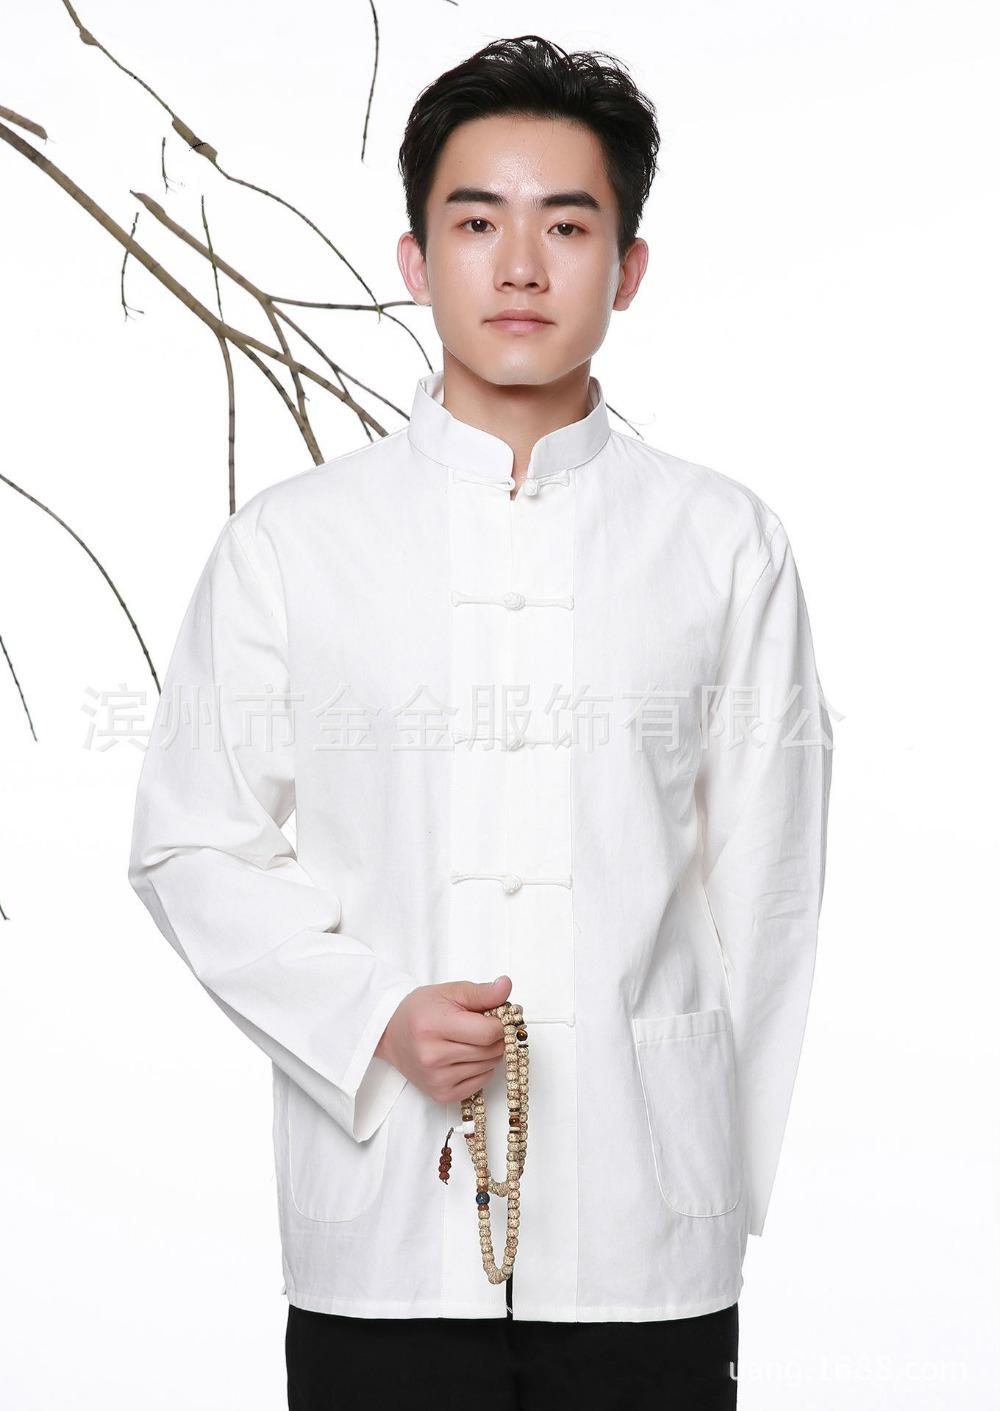 0b43d1baab835 tops china chinese new year clothes traditional chinese fashion style shirt  clothing for men china clothing man kung hanfu men